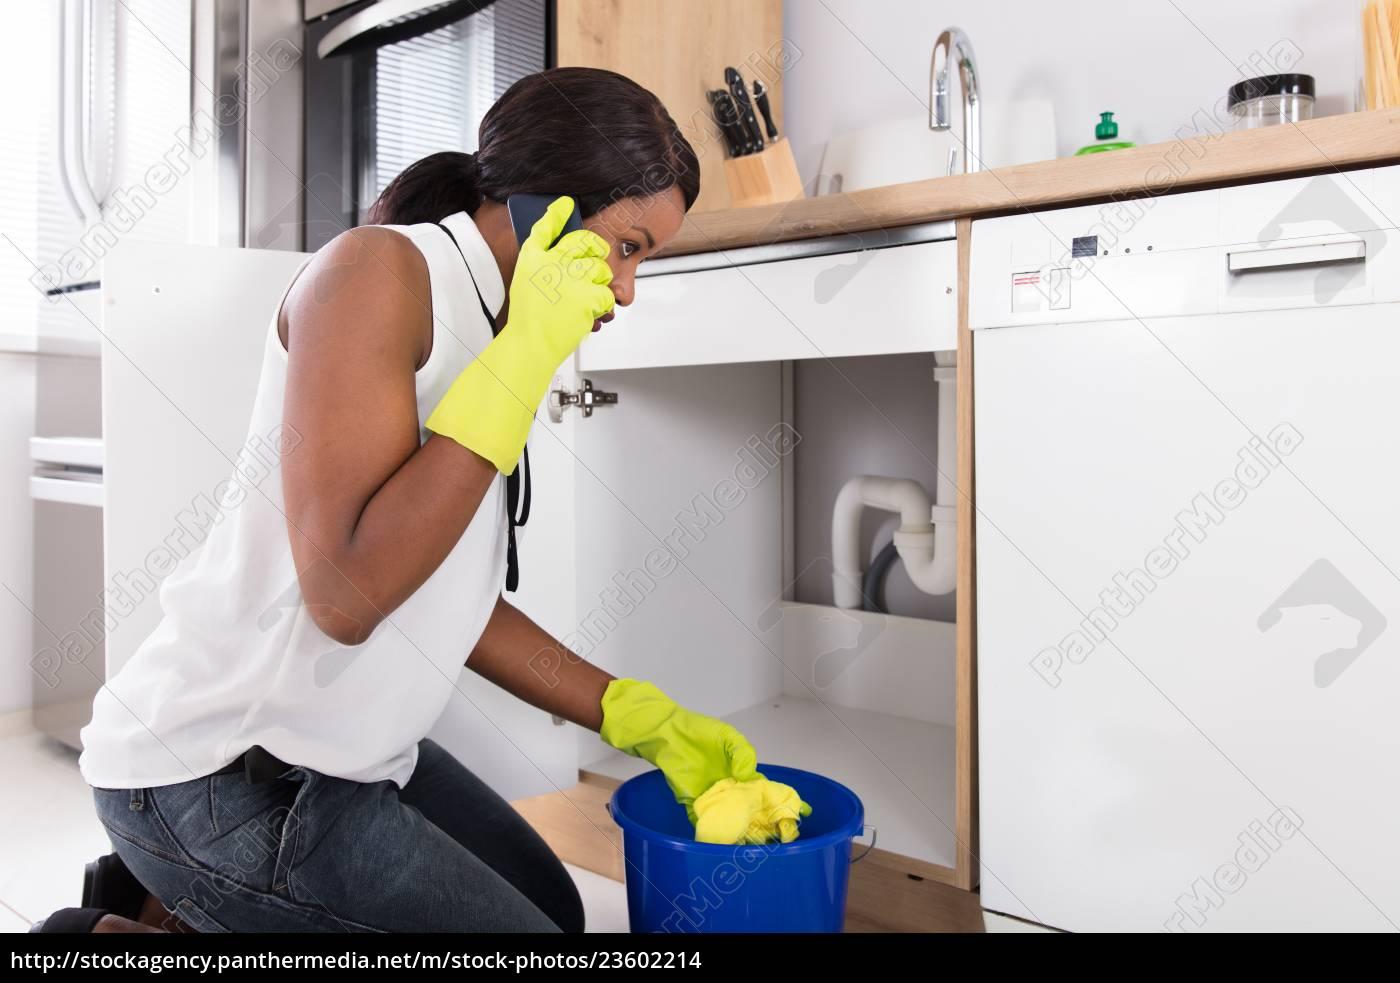 woman, holding, yellow, napkin, calling, plumber - 23602214